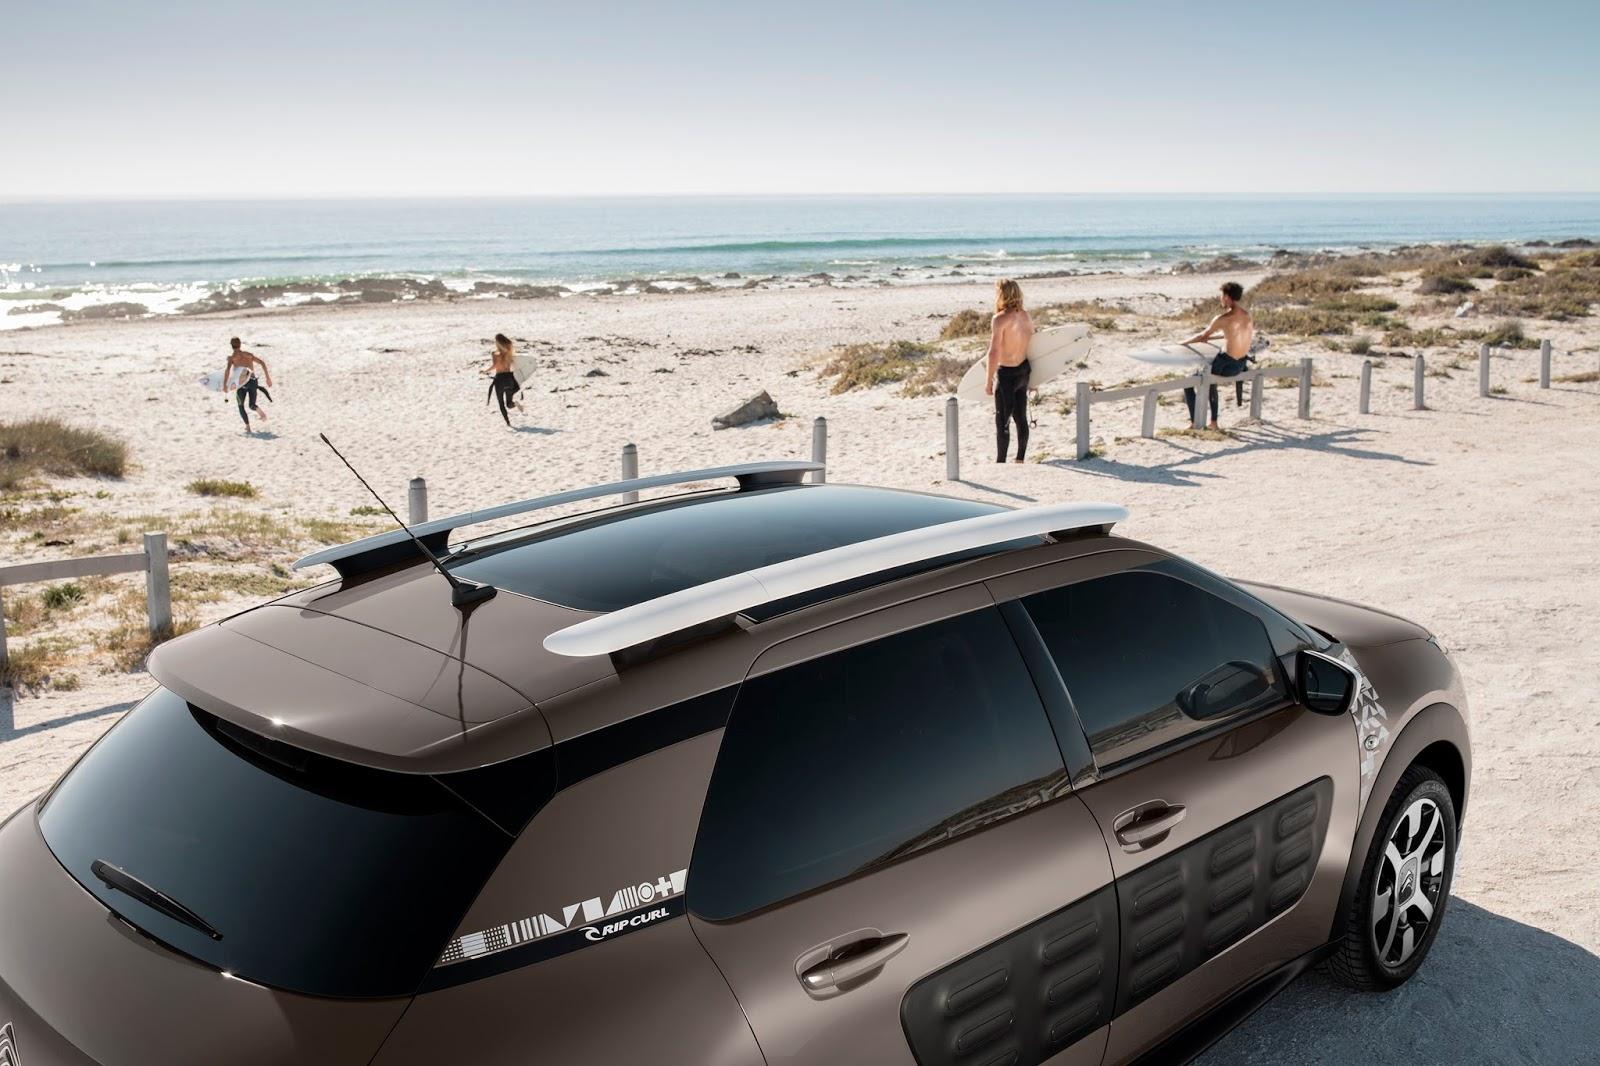 CL%2B16.015.006 Με 5 Παγκόσμιες Πρεμιέρες η Citroën Στο Σαλόνι Αυτοκινήτου της Γενεύης